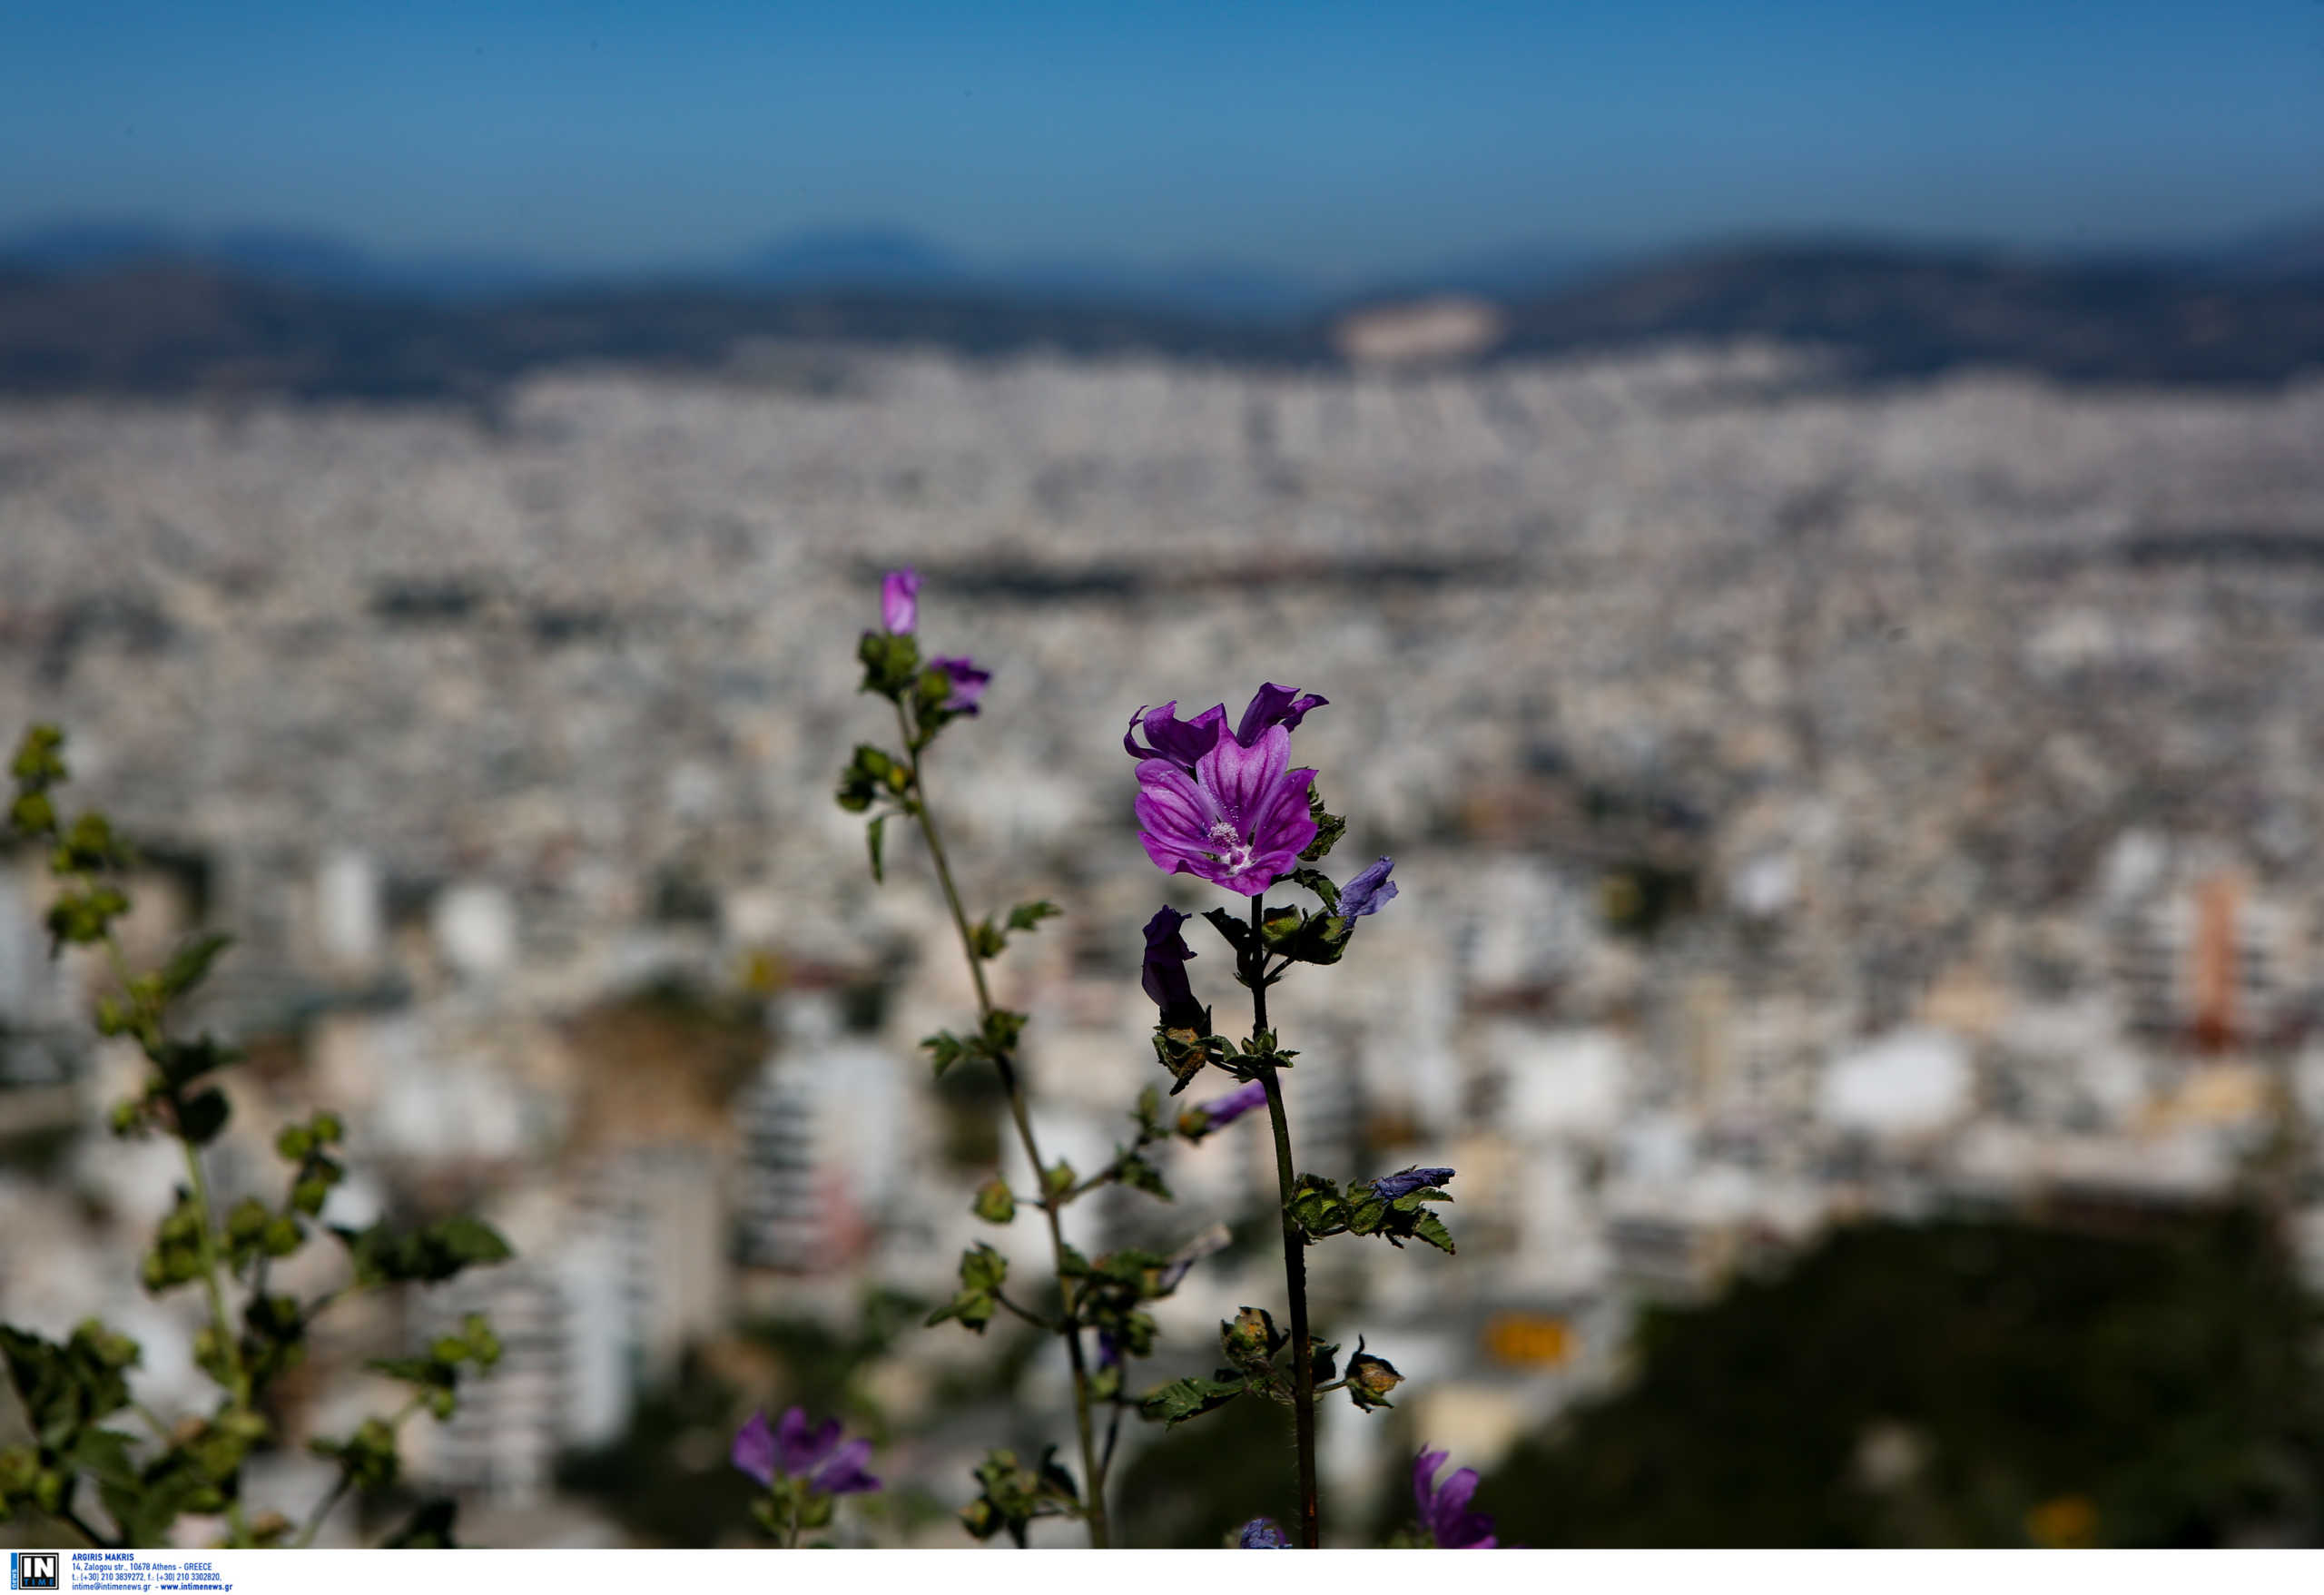 Meteo: Ζεστός ο φετινός χειμώνας στην Ελλάδα – Ποιος ήταν ο θερμότερος μήνας